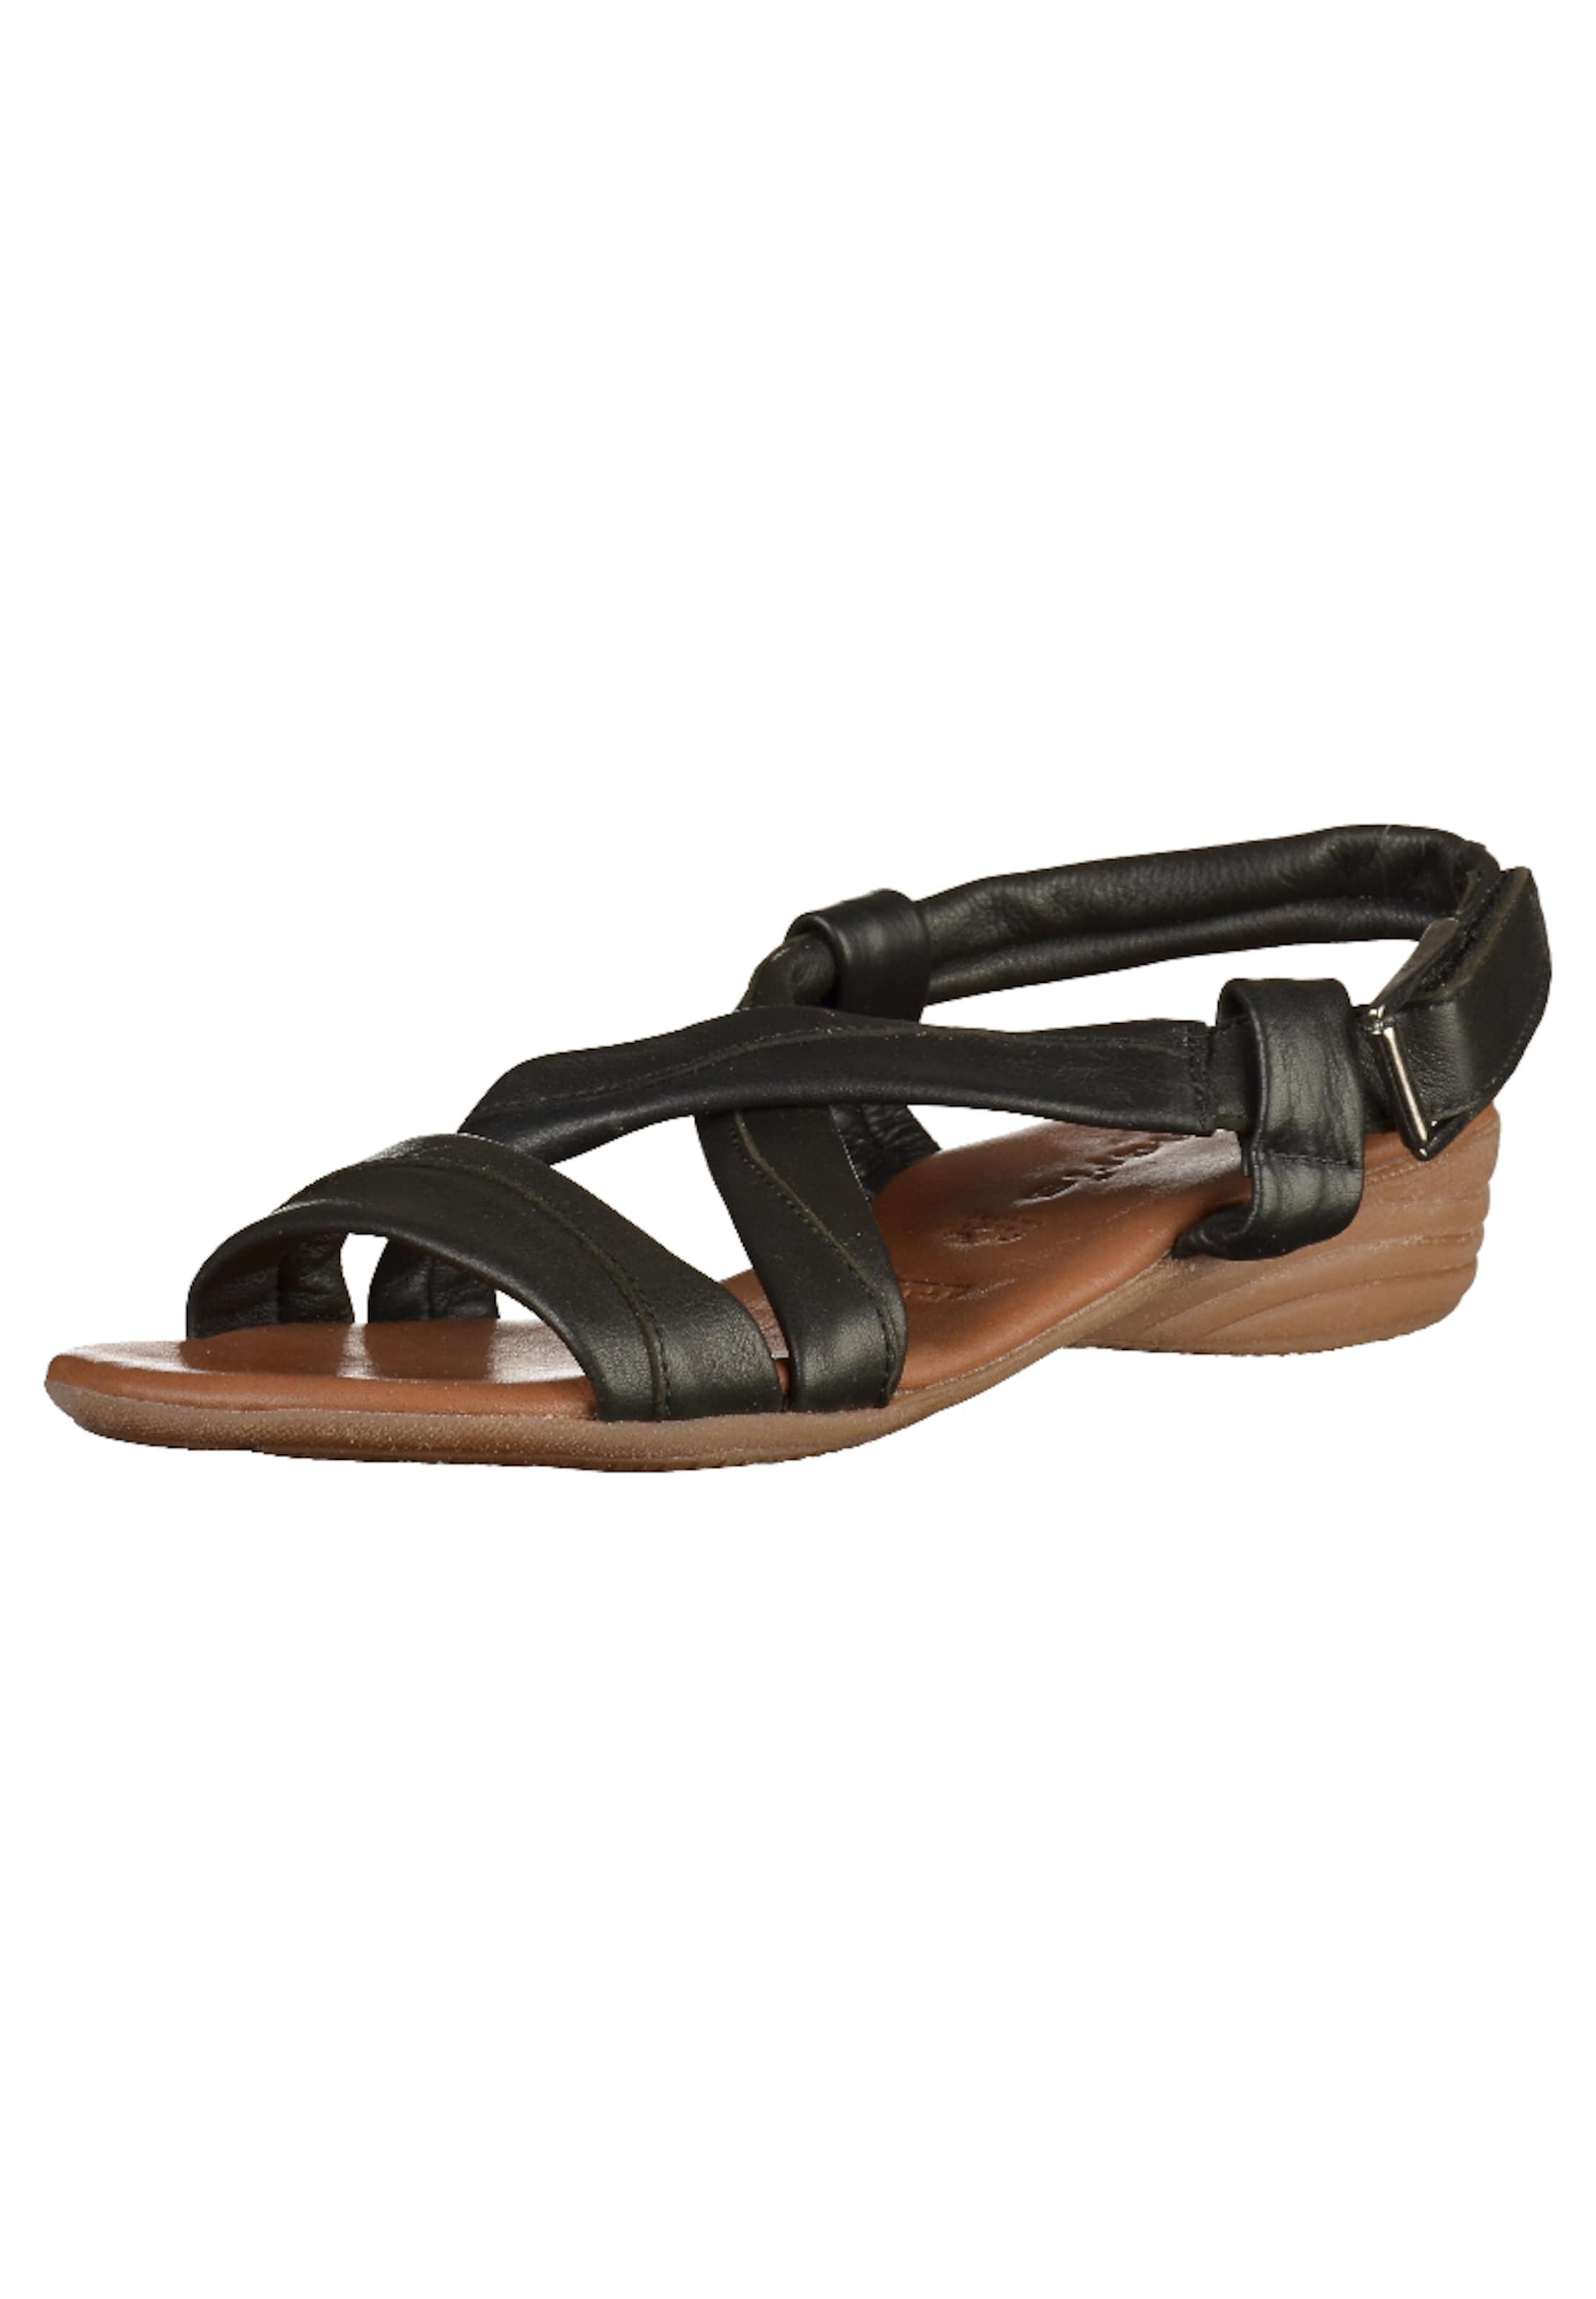 Rabatt Neue Stile TAMARIS Sandalette Rabatt Hohe Qualität Billig Verkauf Manchester Niedriger Versandverkauf Online hRIIjf7